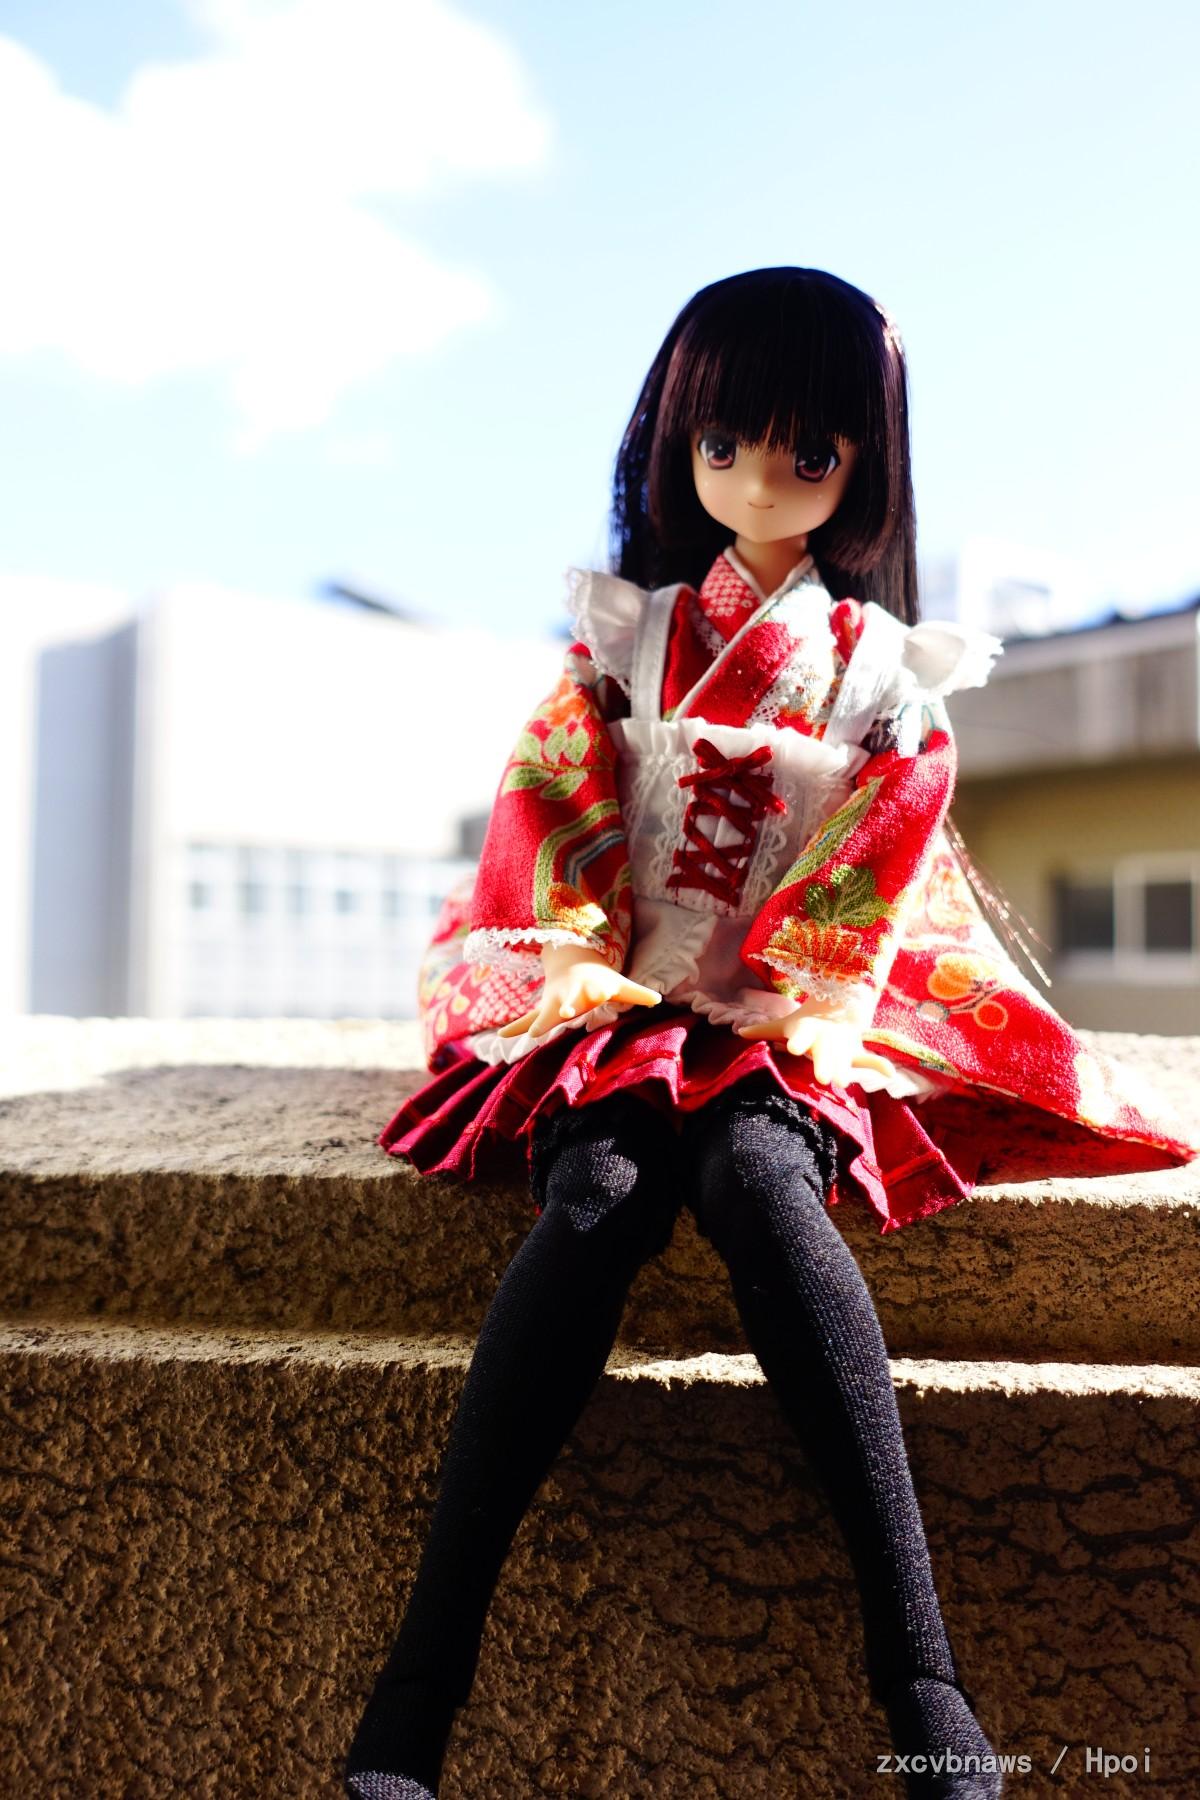 PureNeemo Maya Azone Direct Store Limited ver.-Garage Kit Dolls